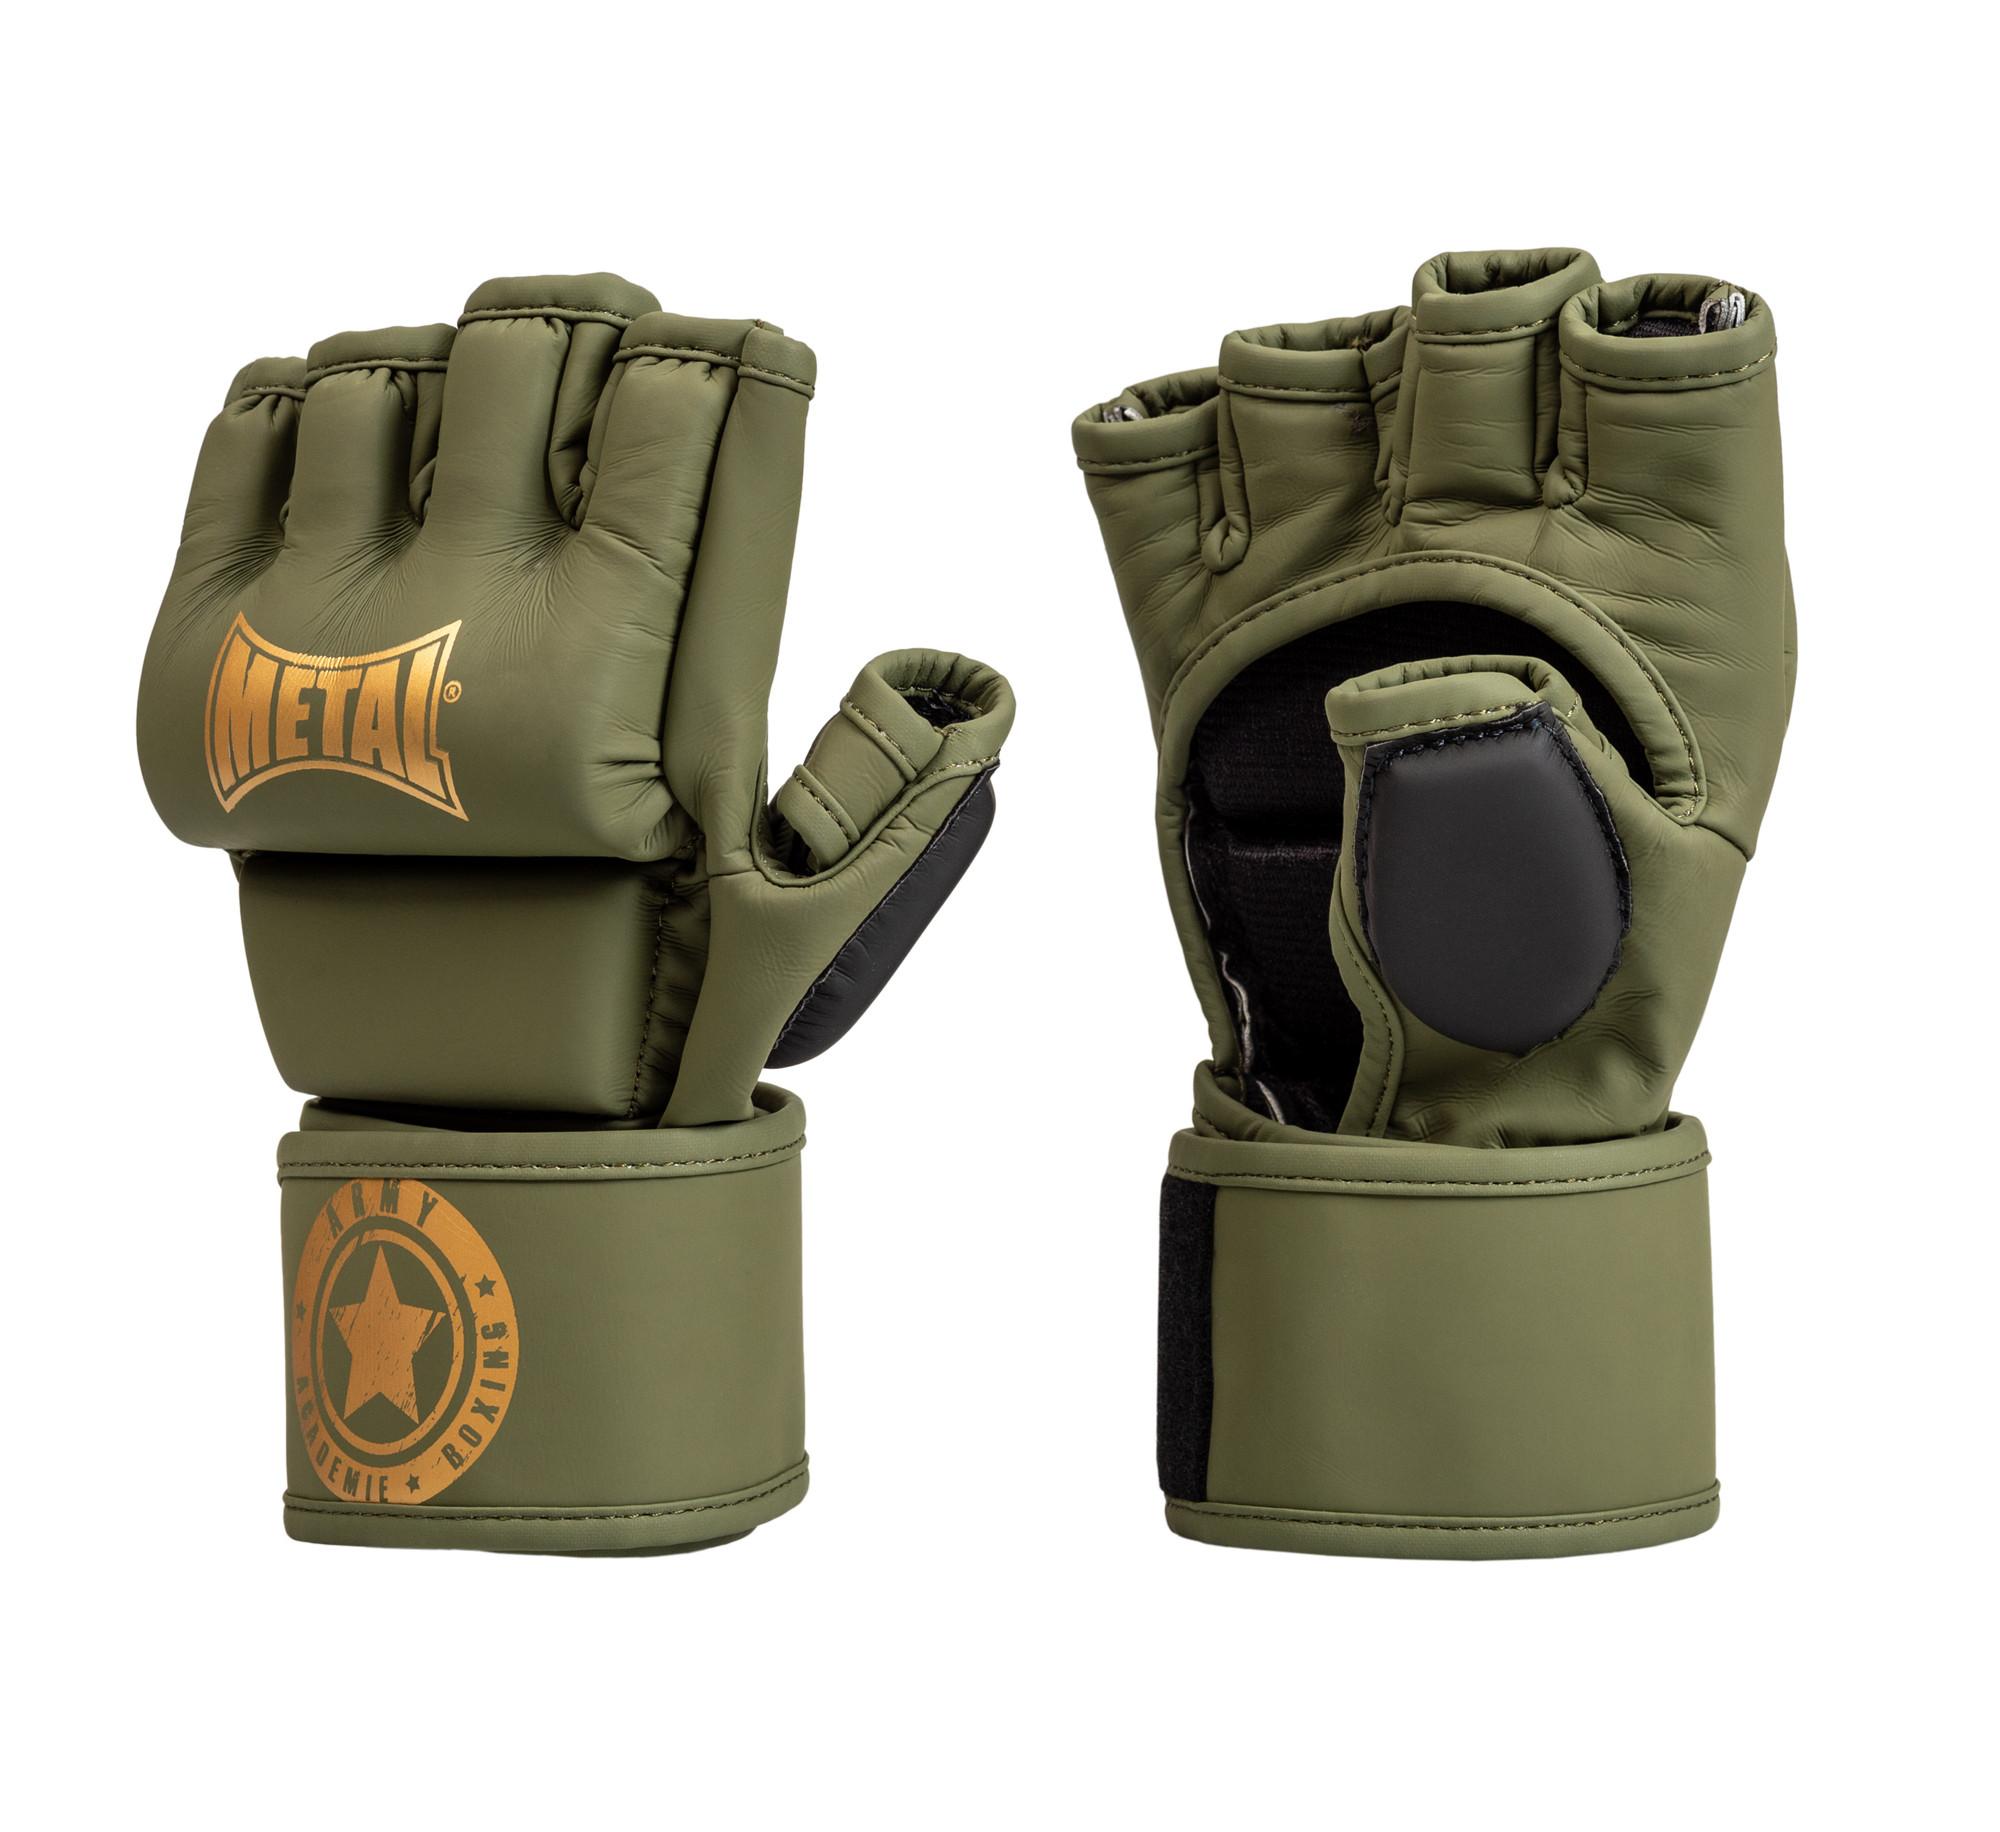 Gants de MMA Métal boxe Military